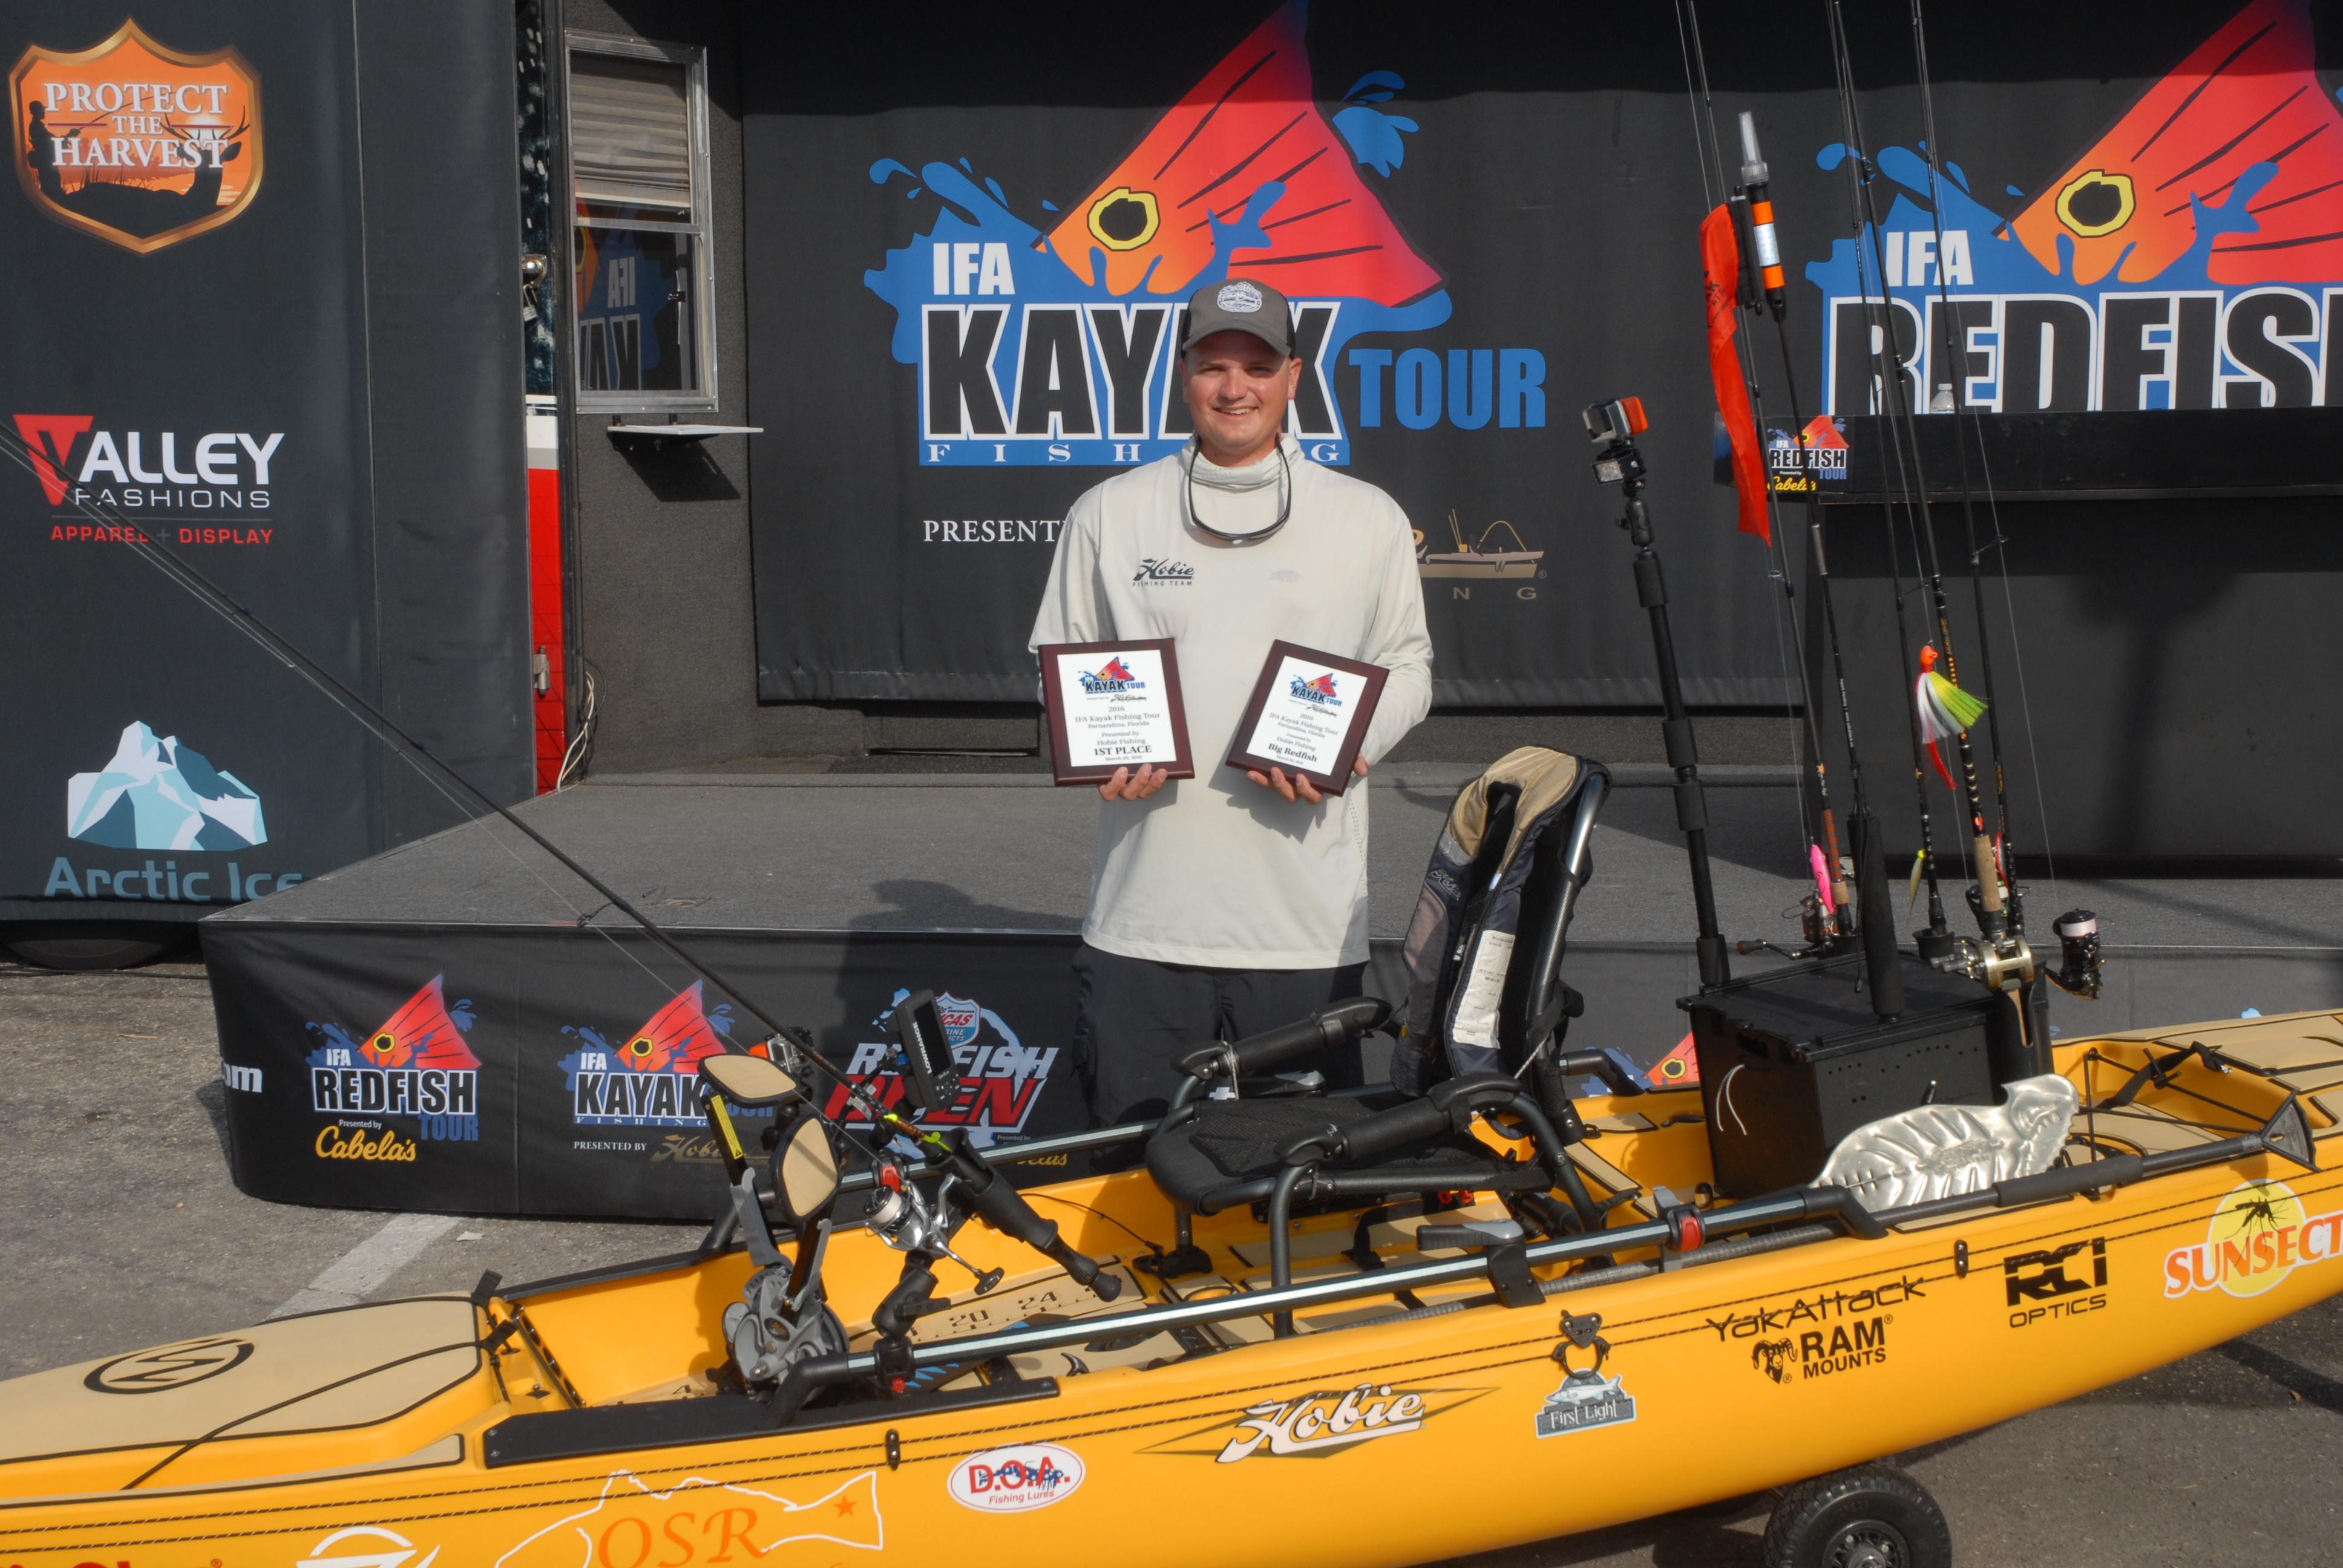 YakAttack Kayak Fishing Thad Day IFA Kayak Tour Big Redfish Hobie Pro Angler